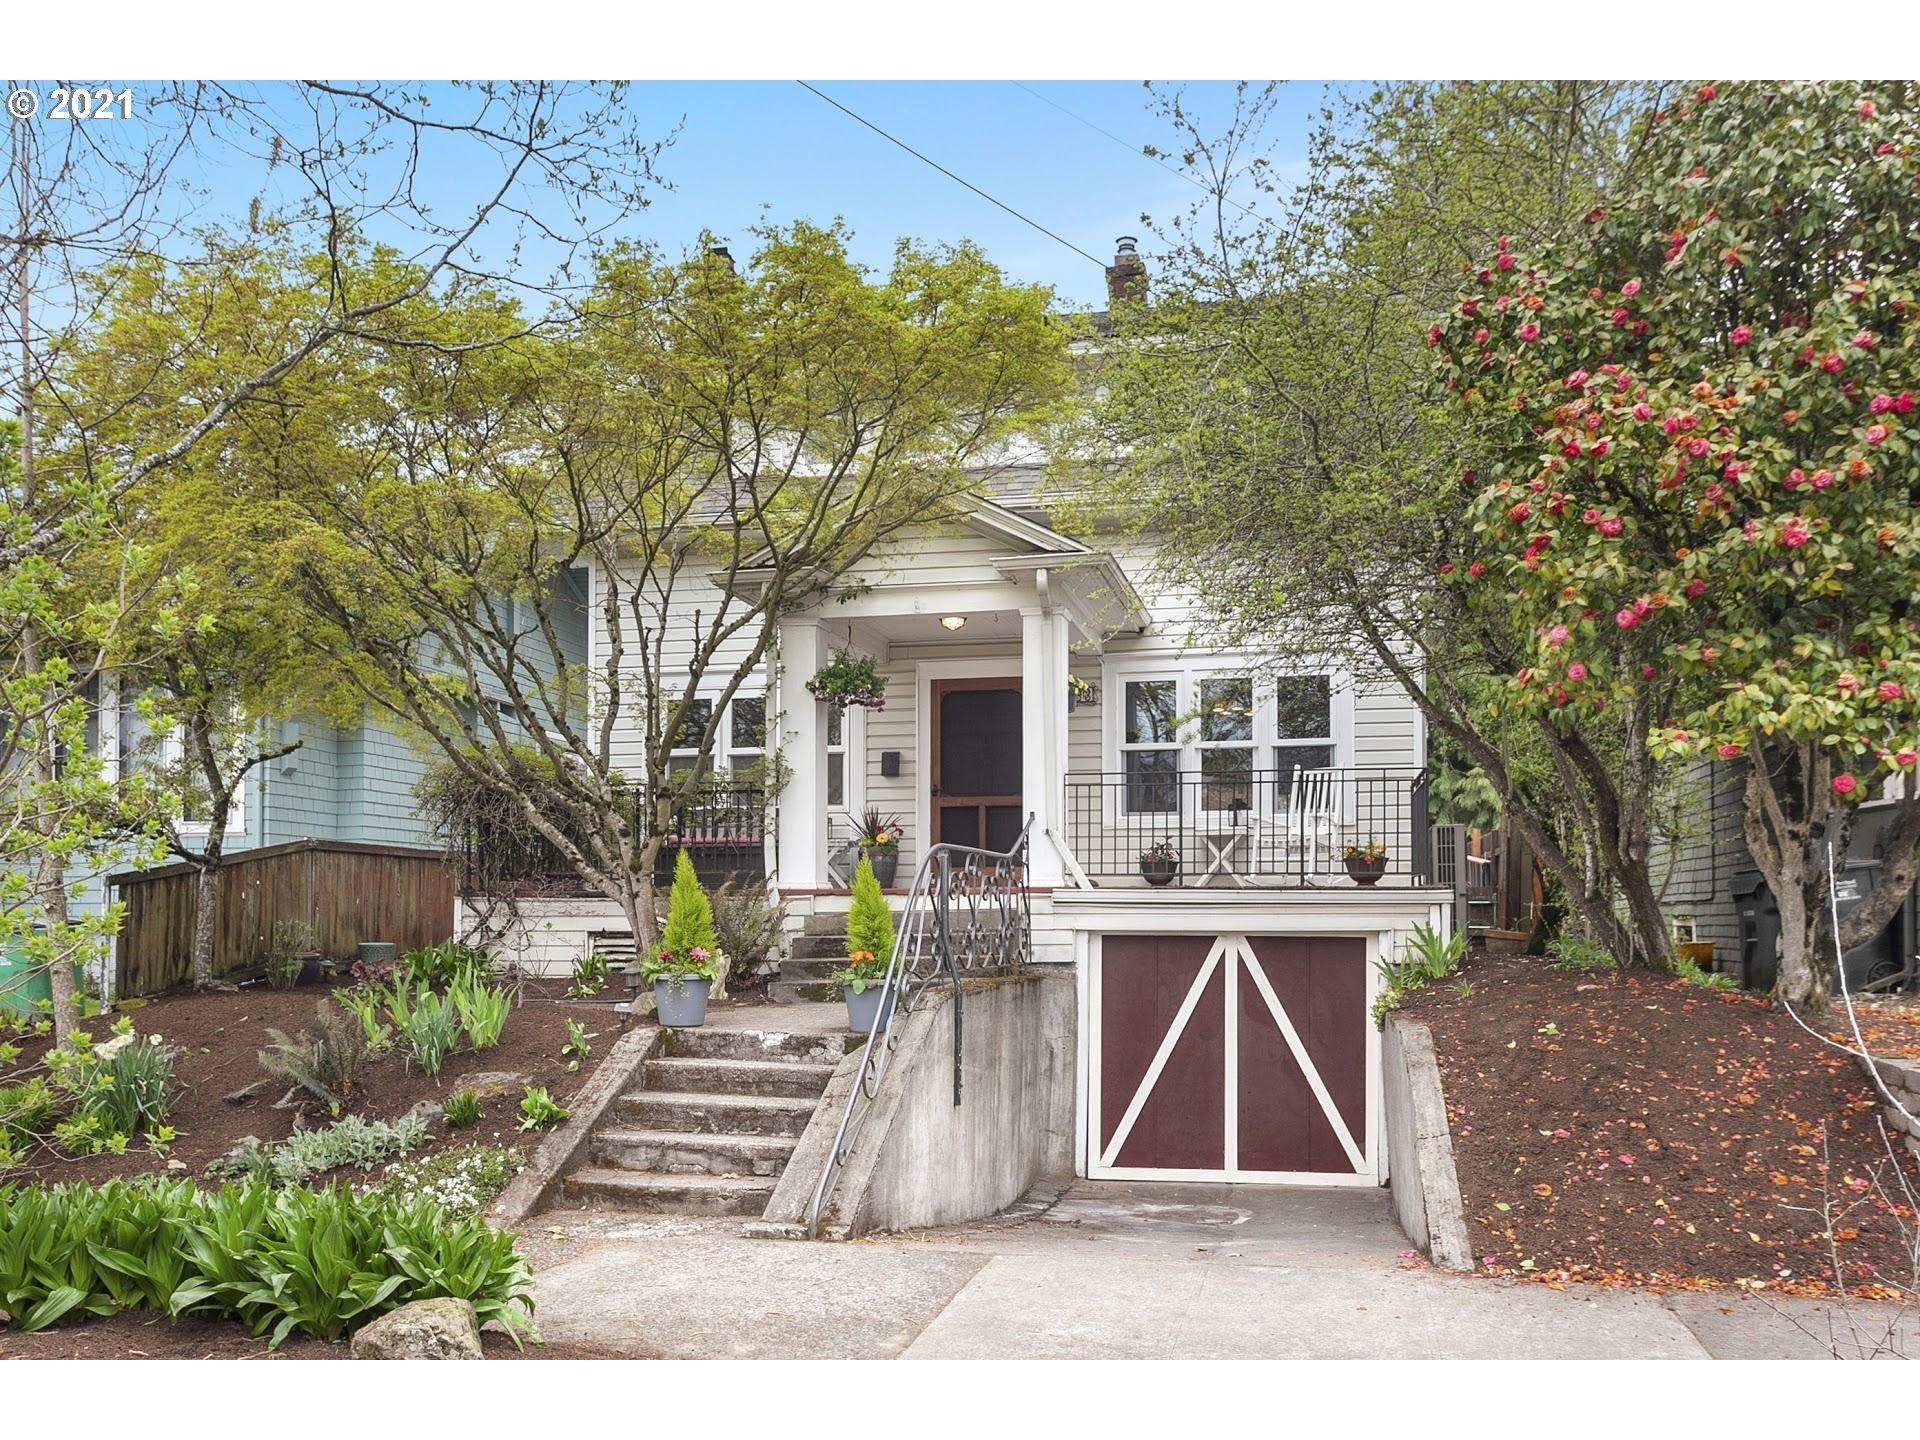 3433 NE 59TH AVE, Portland, OR 97213 - MLS#: 21019209